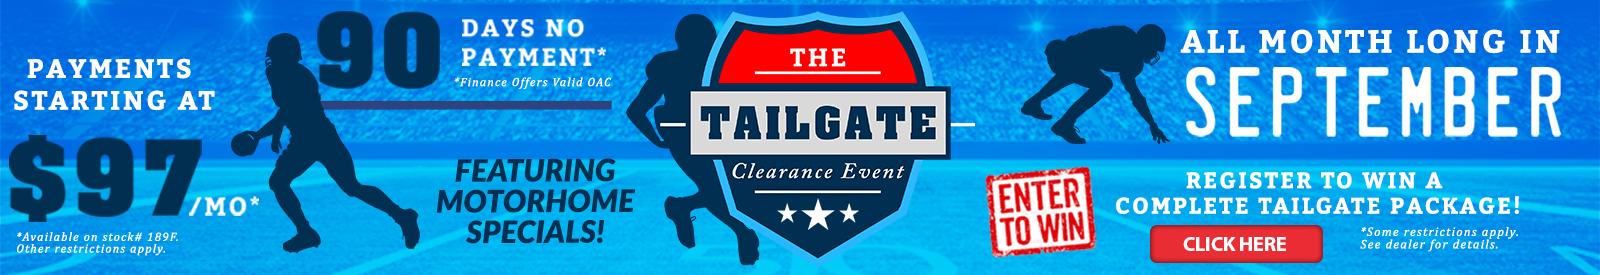 Bretz RV Tailgate sale